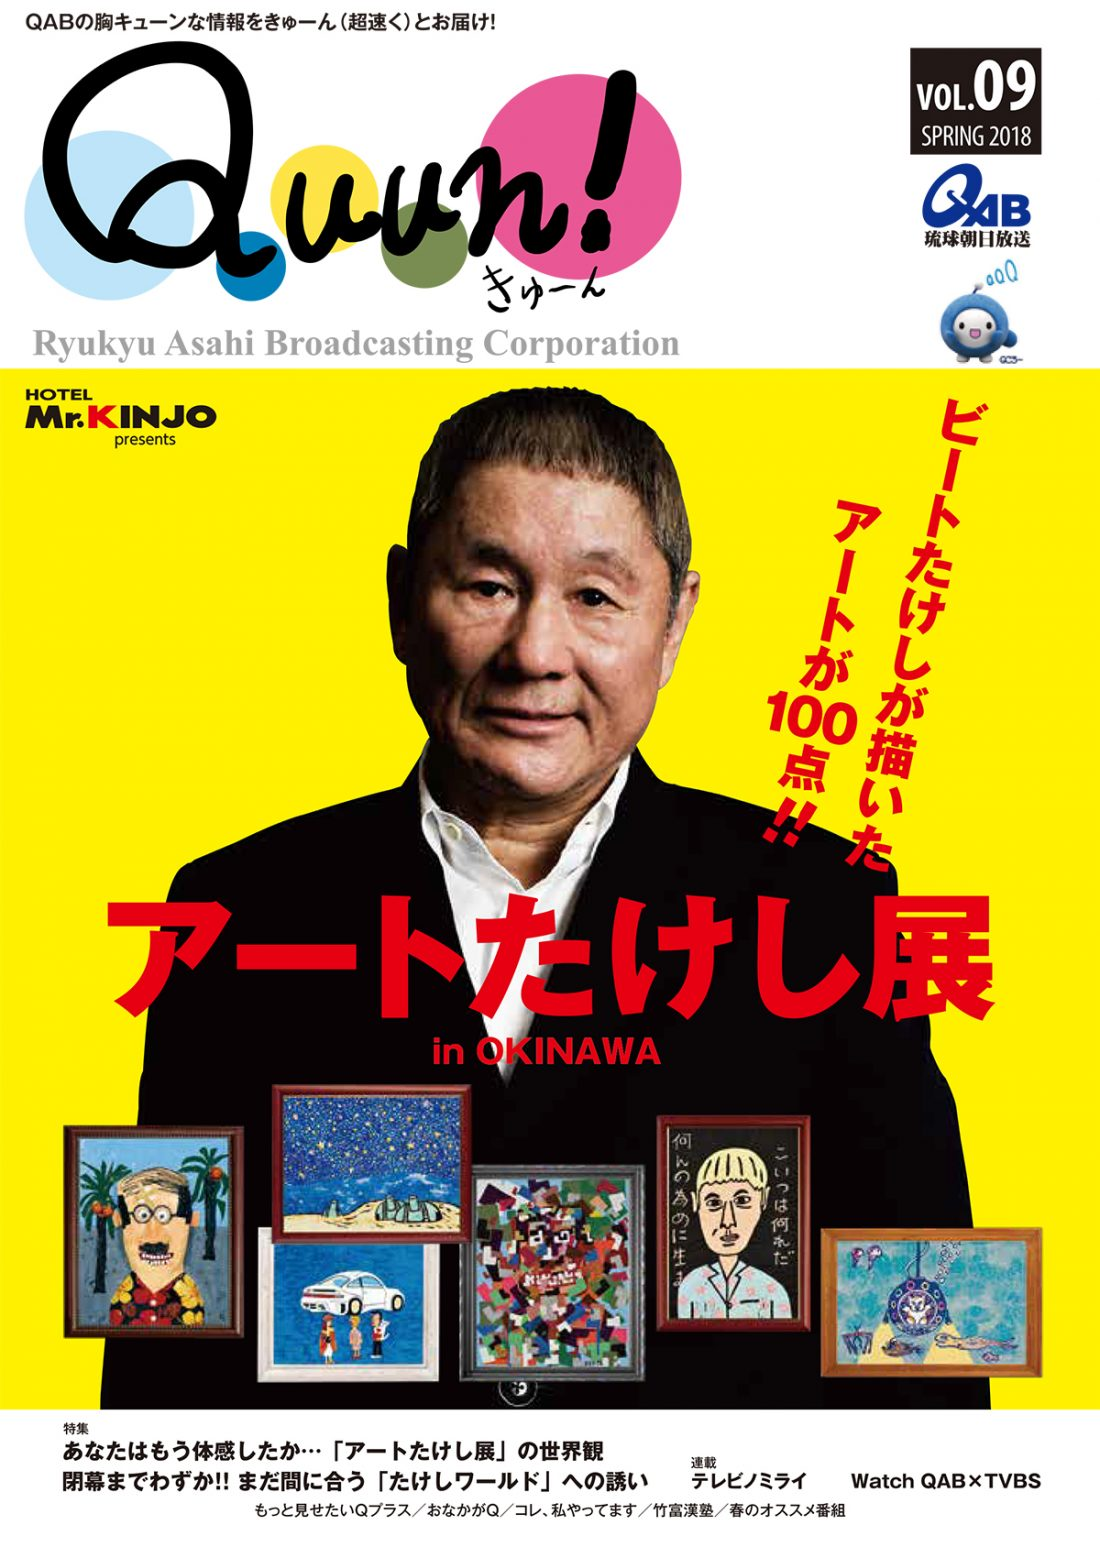 http://www.qab.co.jp/qgoro/wp-content/uploads/quun_0901-1100x1558.jpg